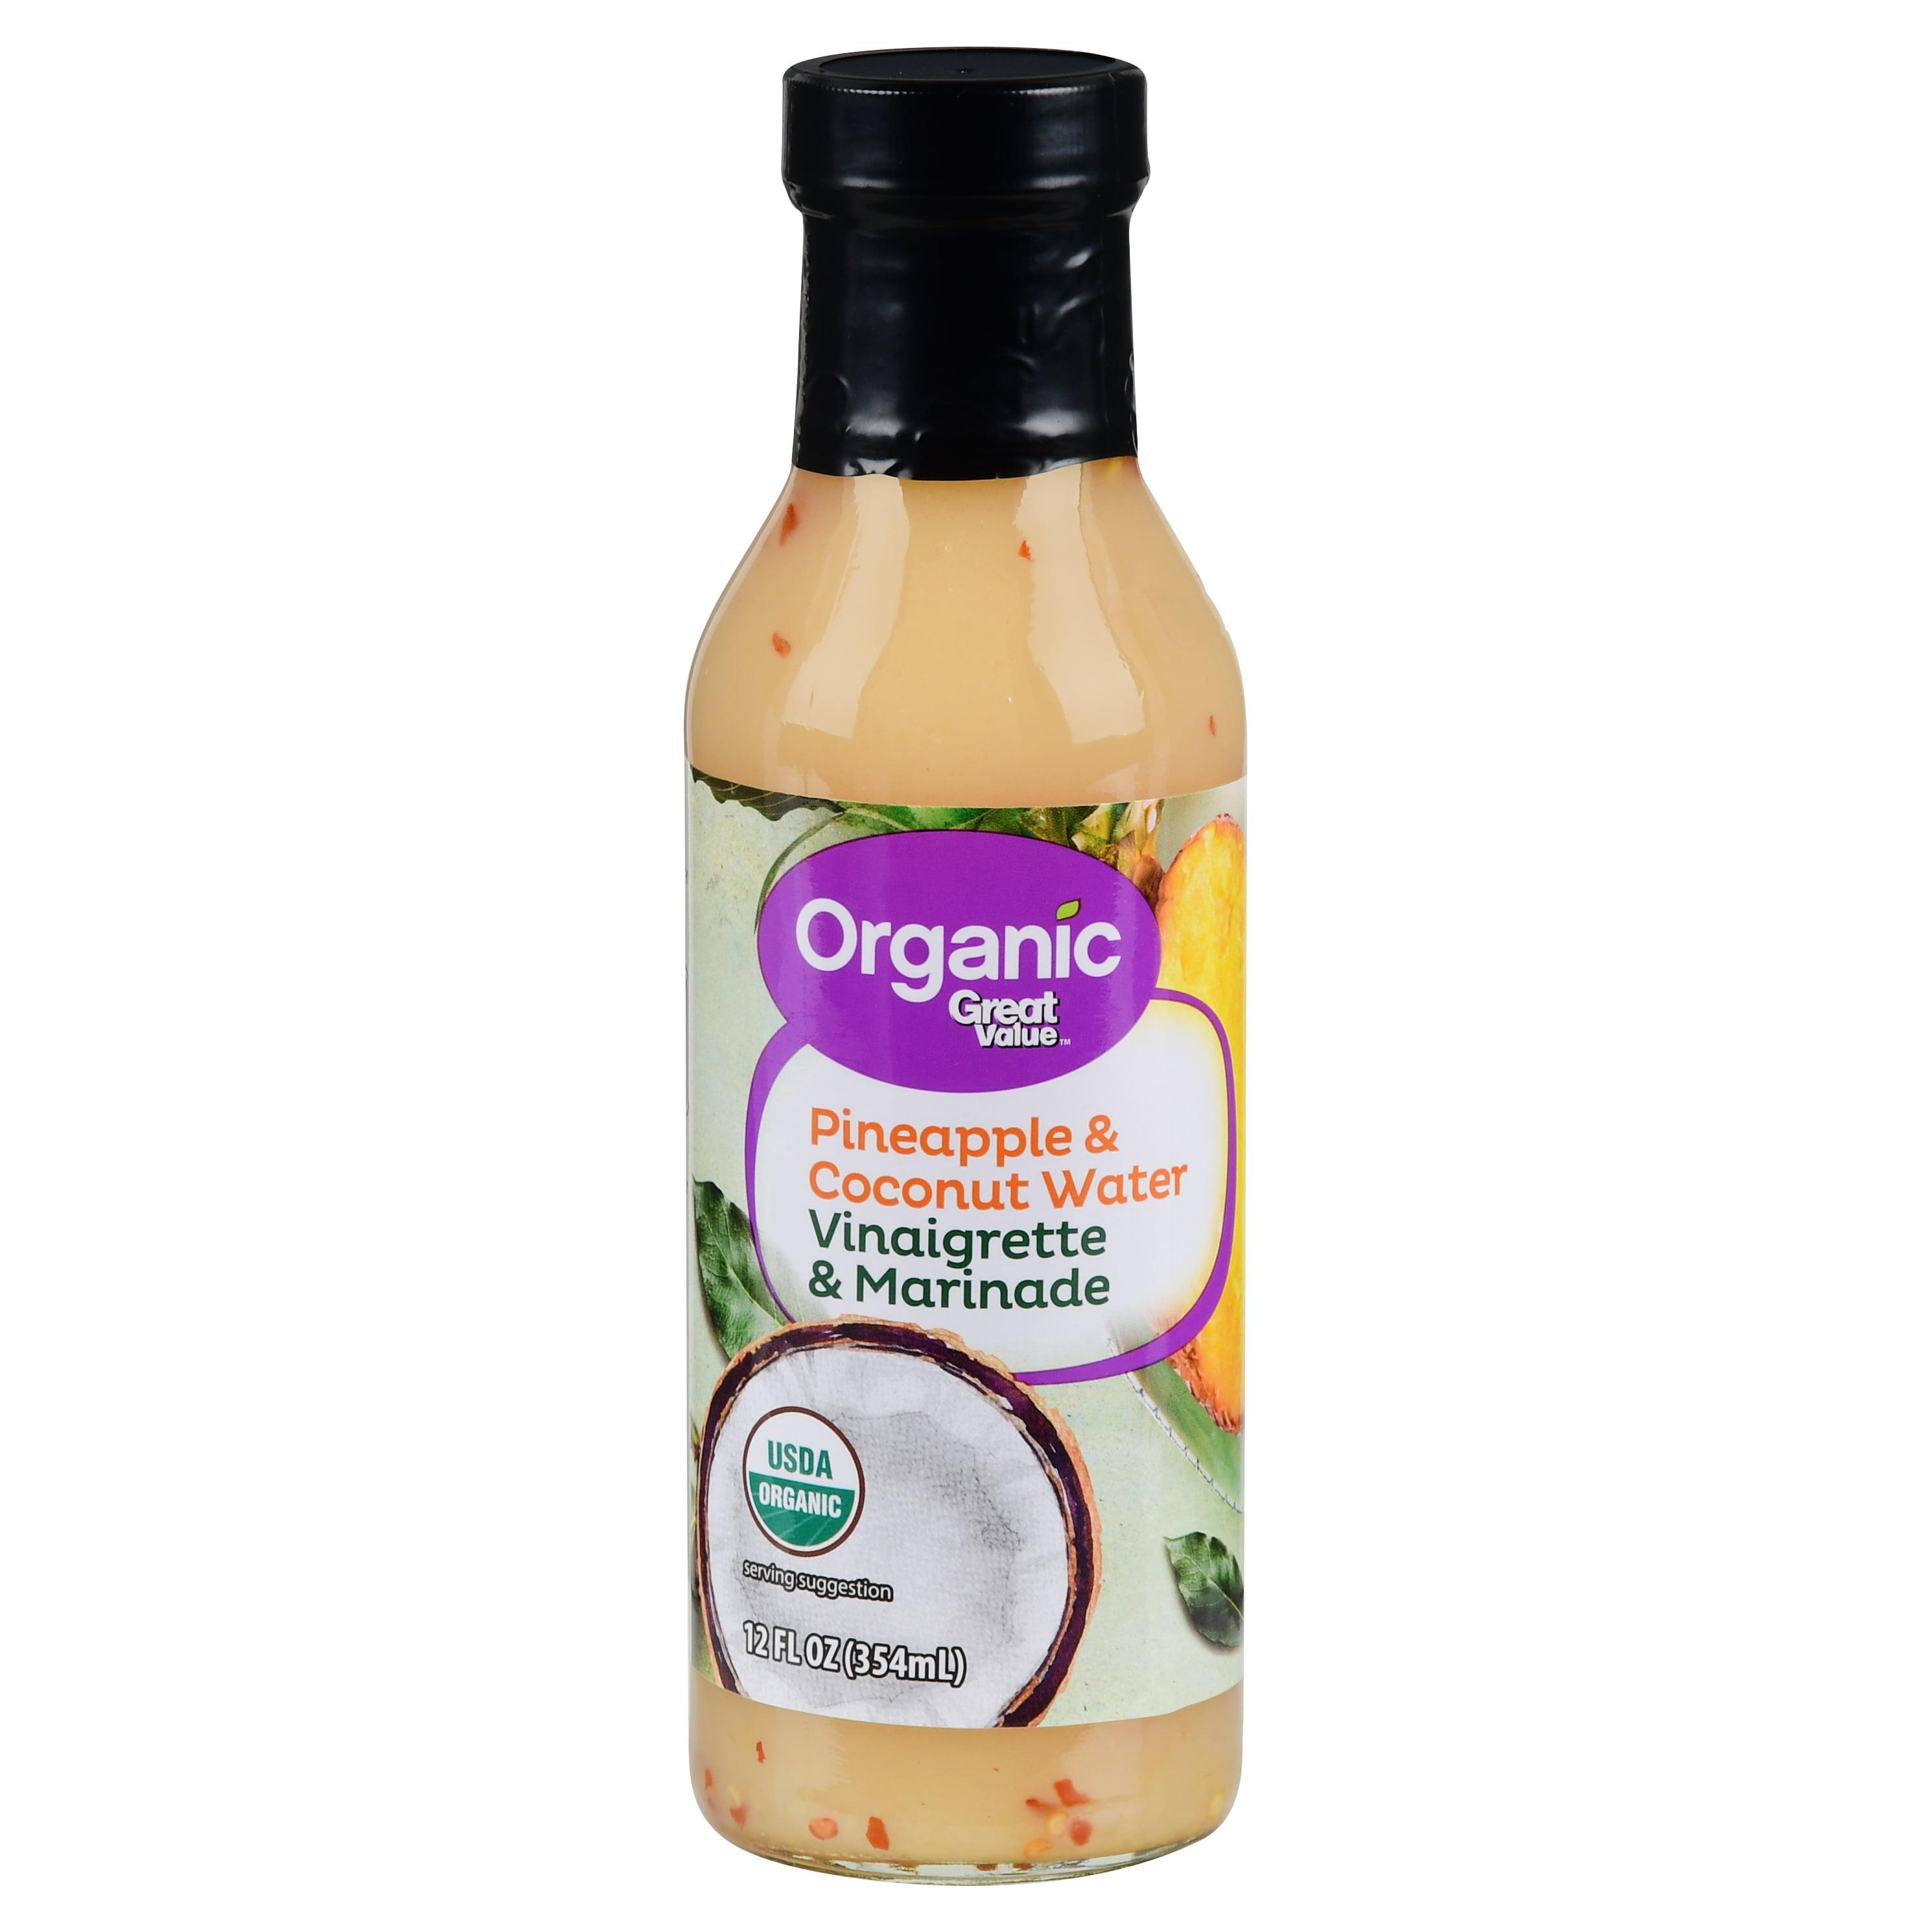 (2 Pack) Great Value Organic Pineapple & Coconut Water Vinaigrette & Marinade, 12 fl oz